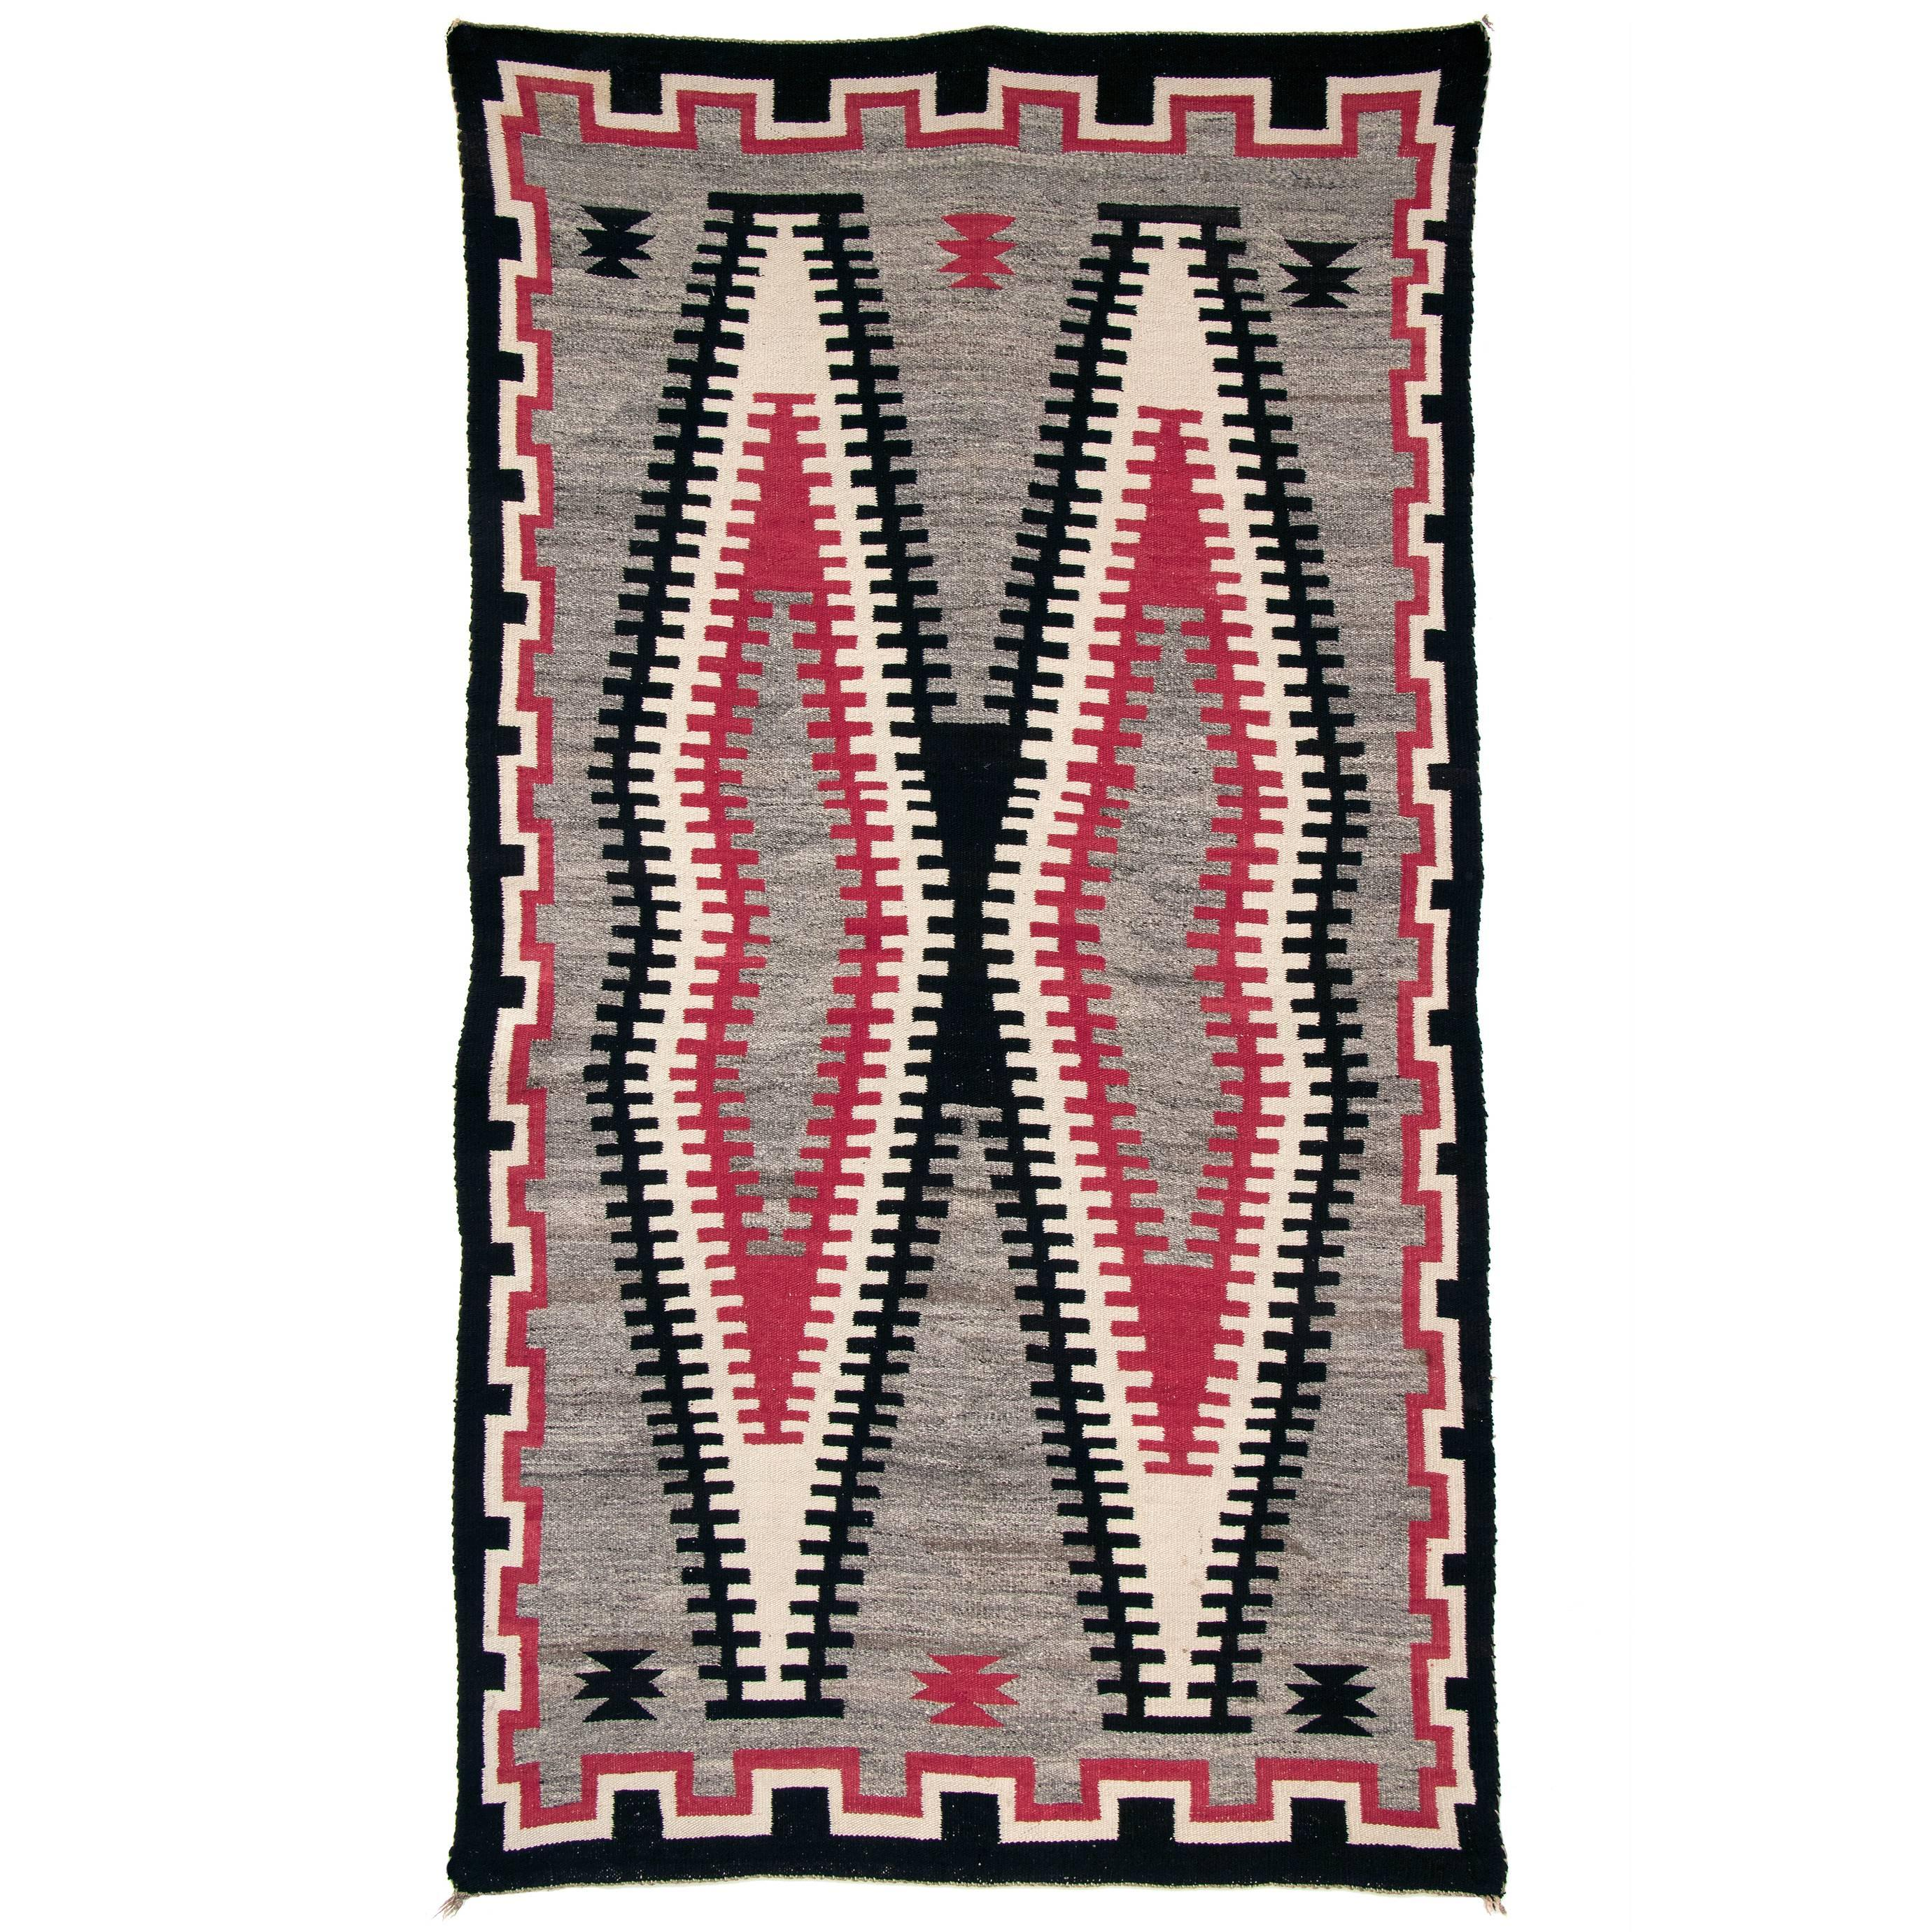 Vintage Navajo Trading Post Rug, circa 1930